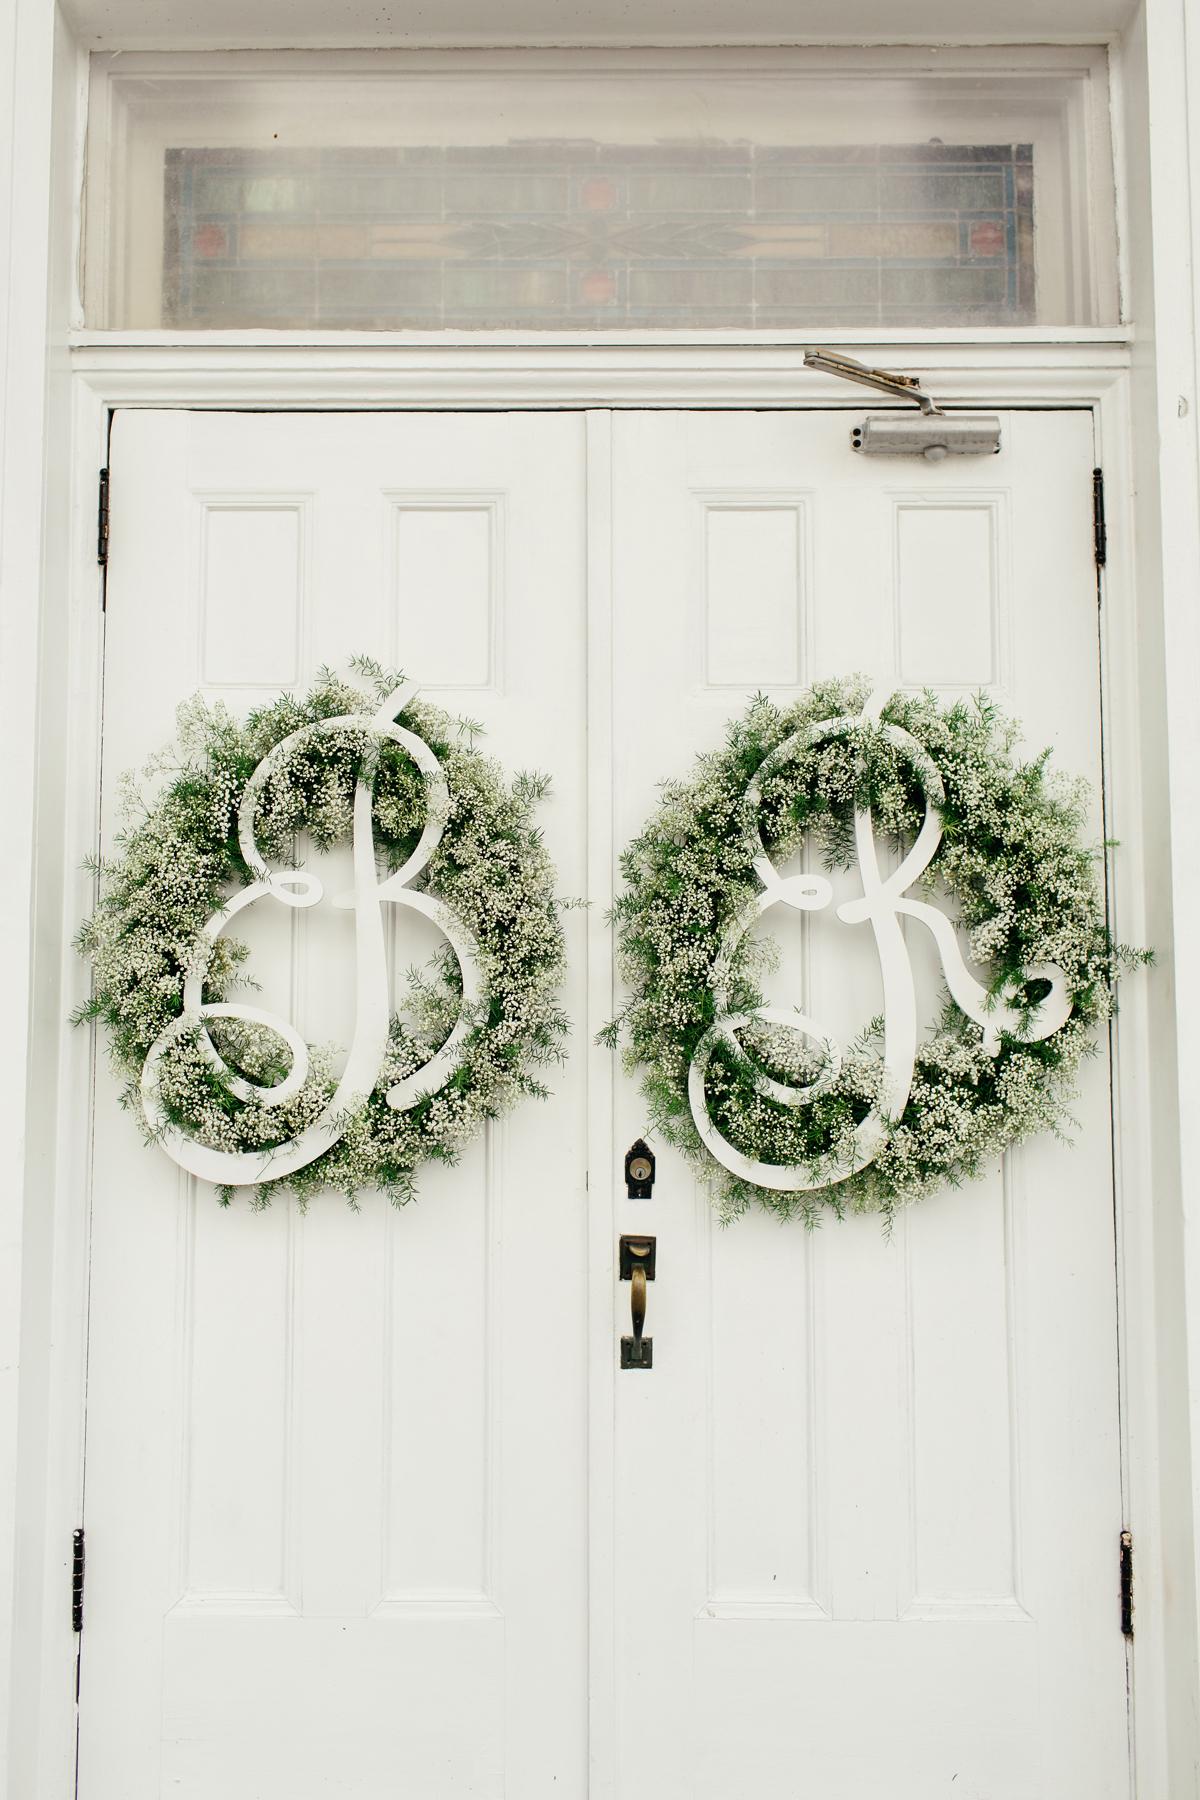 wedding wreaths monogramed hanging on white double doors